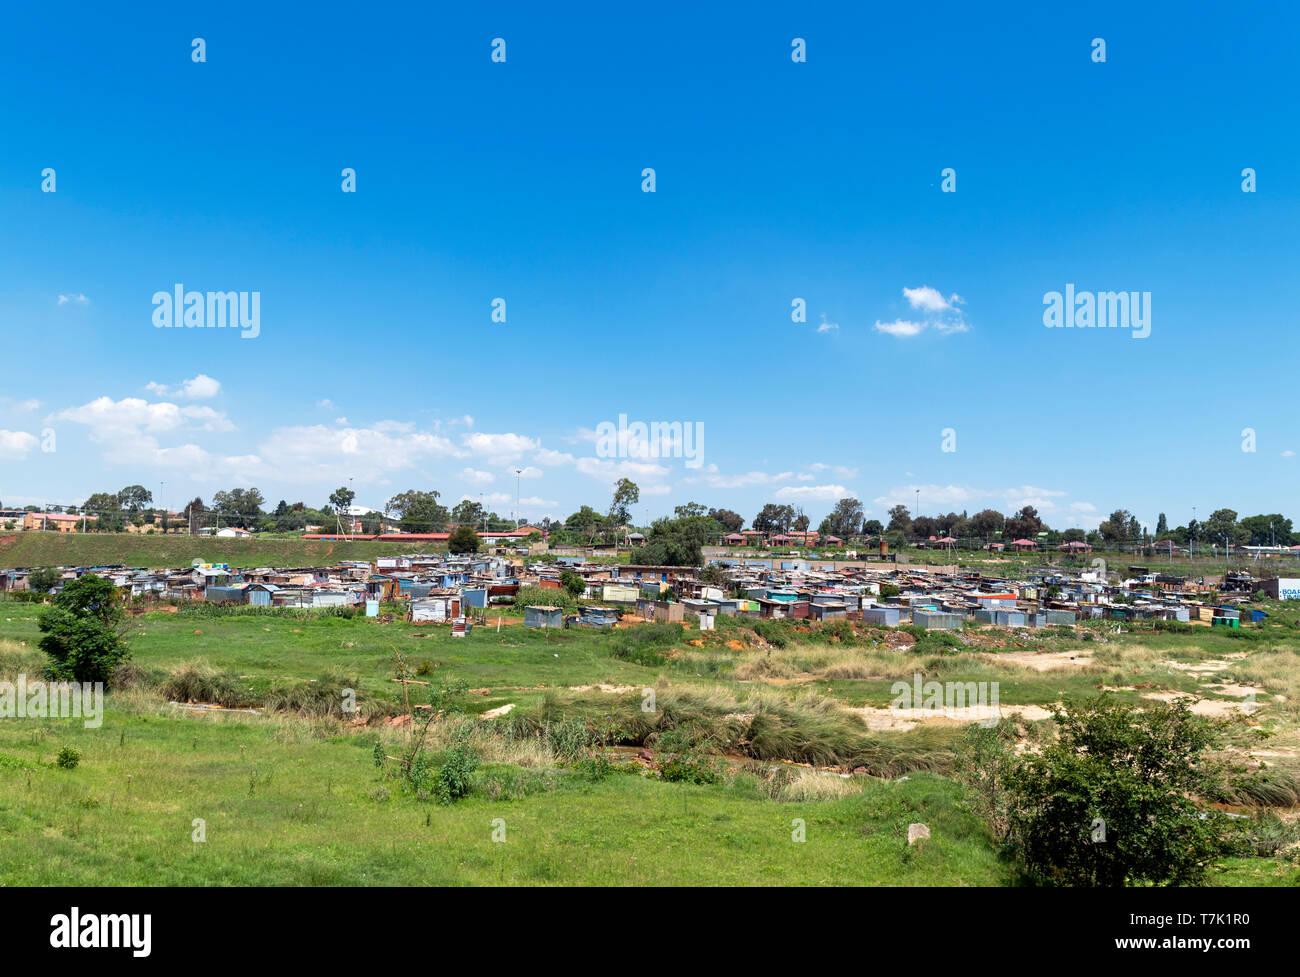 Baraccopoli abitazioni di Orlando West, Johannesburg, Sud Africa Foto Stock